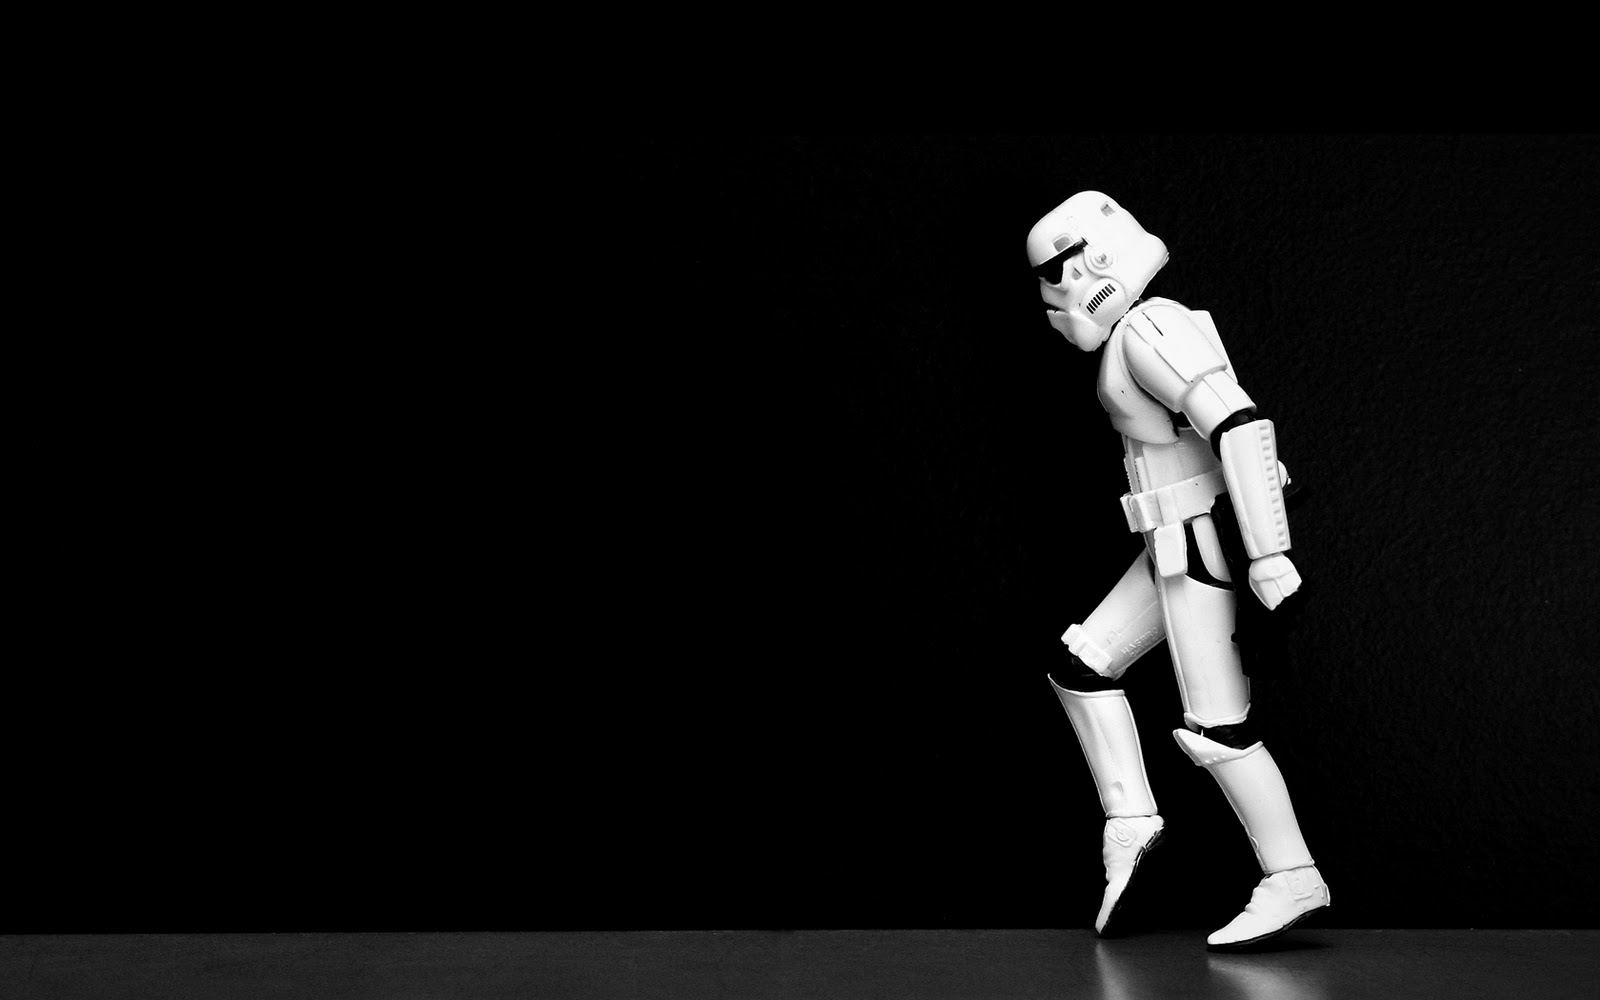 Star Wars Storm Trooper Dance2 Android Wallpaper 1600x1000